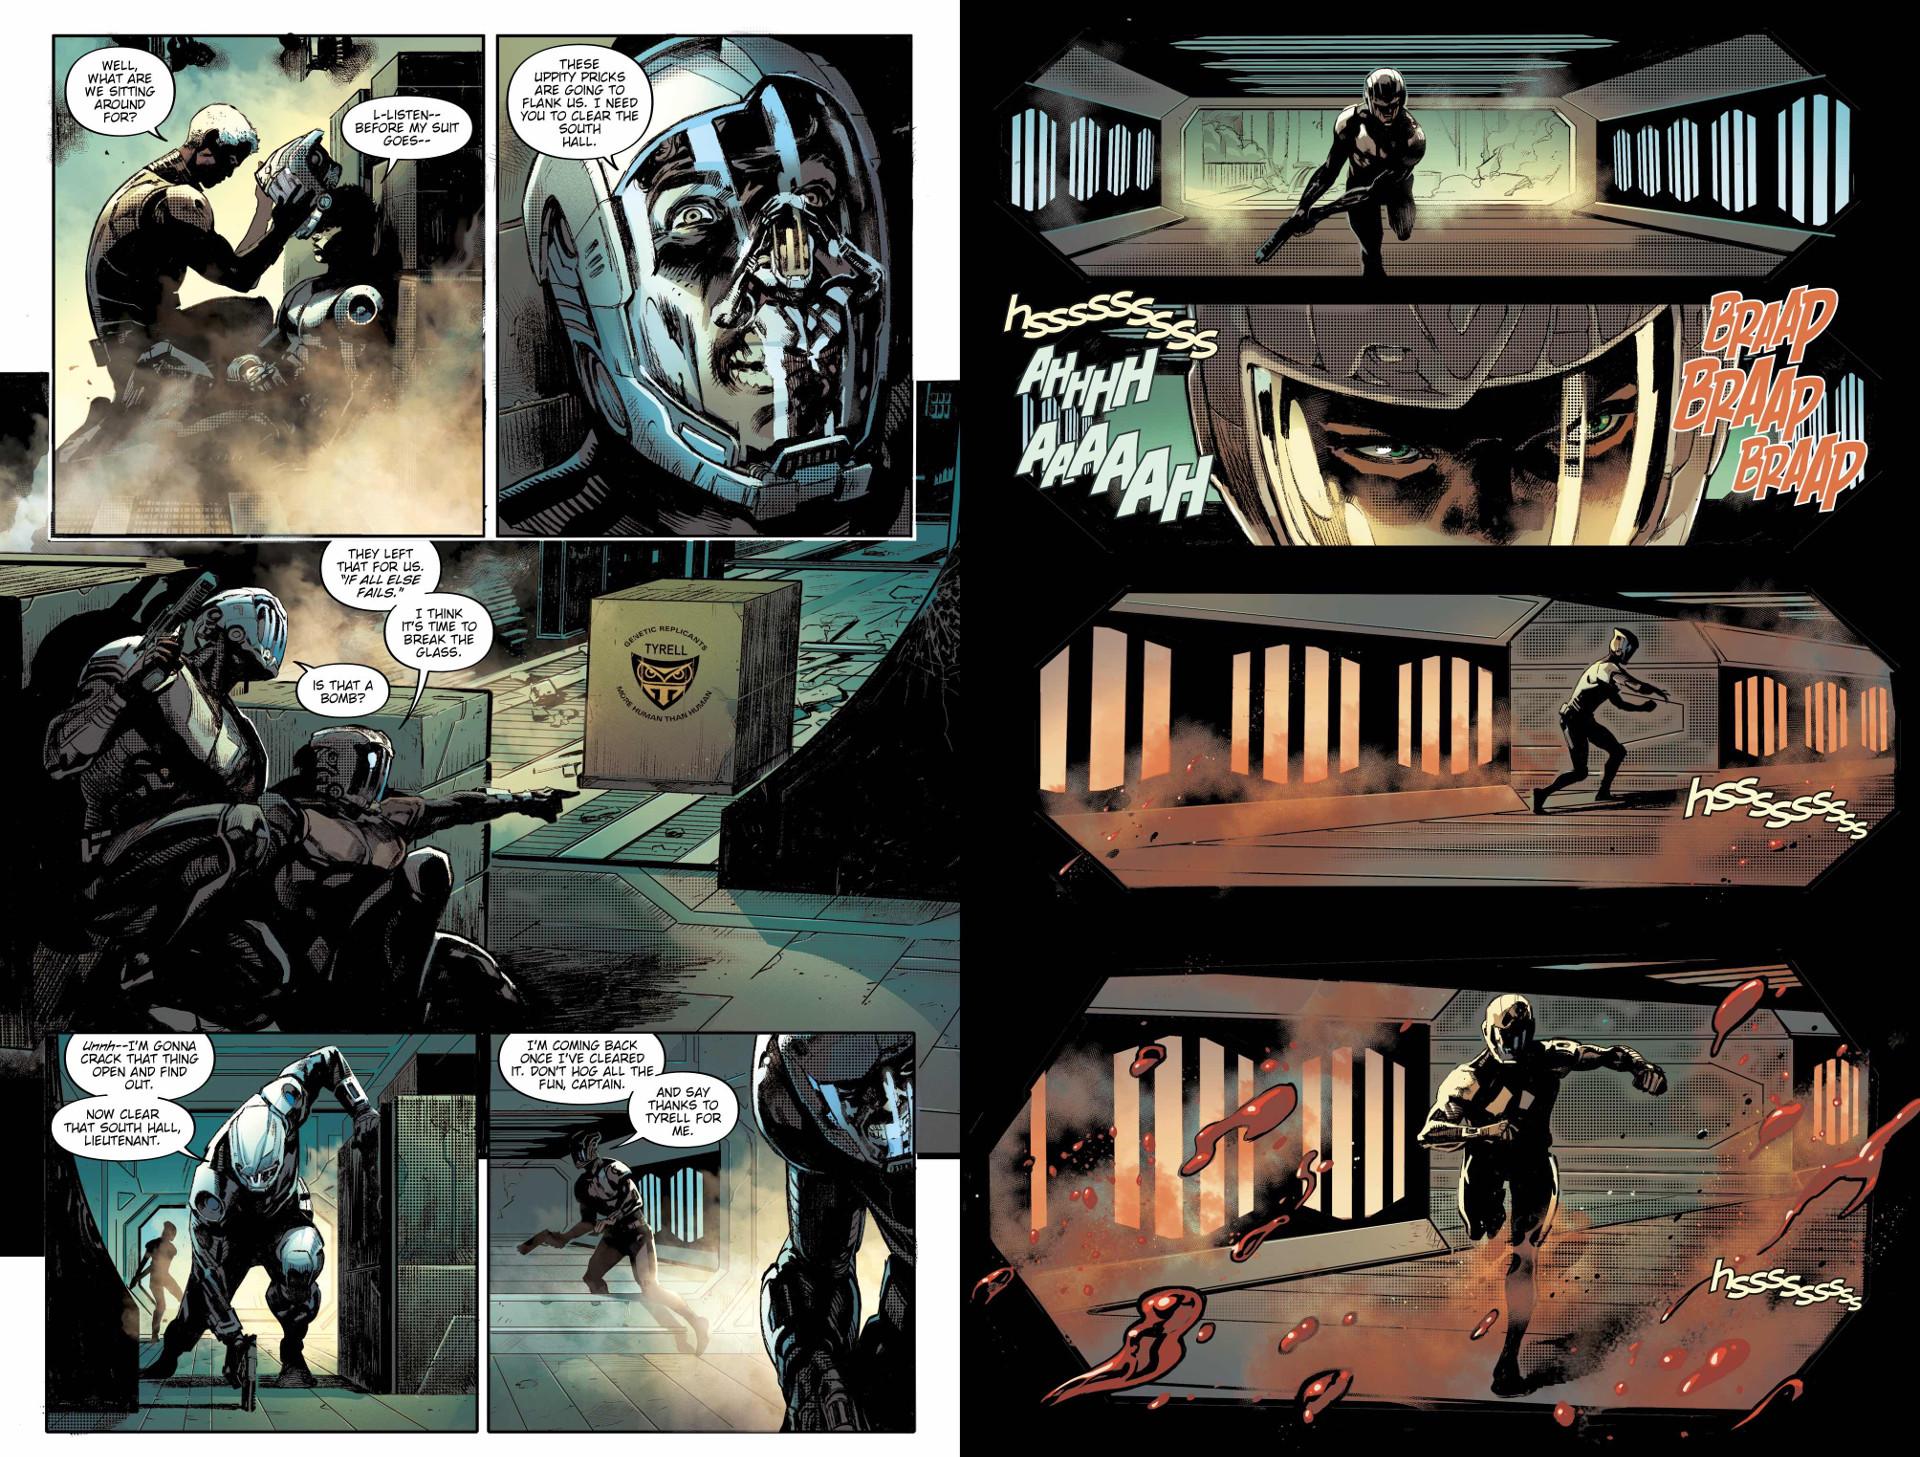 Blade_Runner_Origins_1_Page1-2